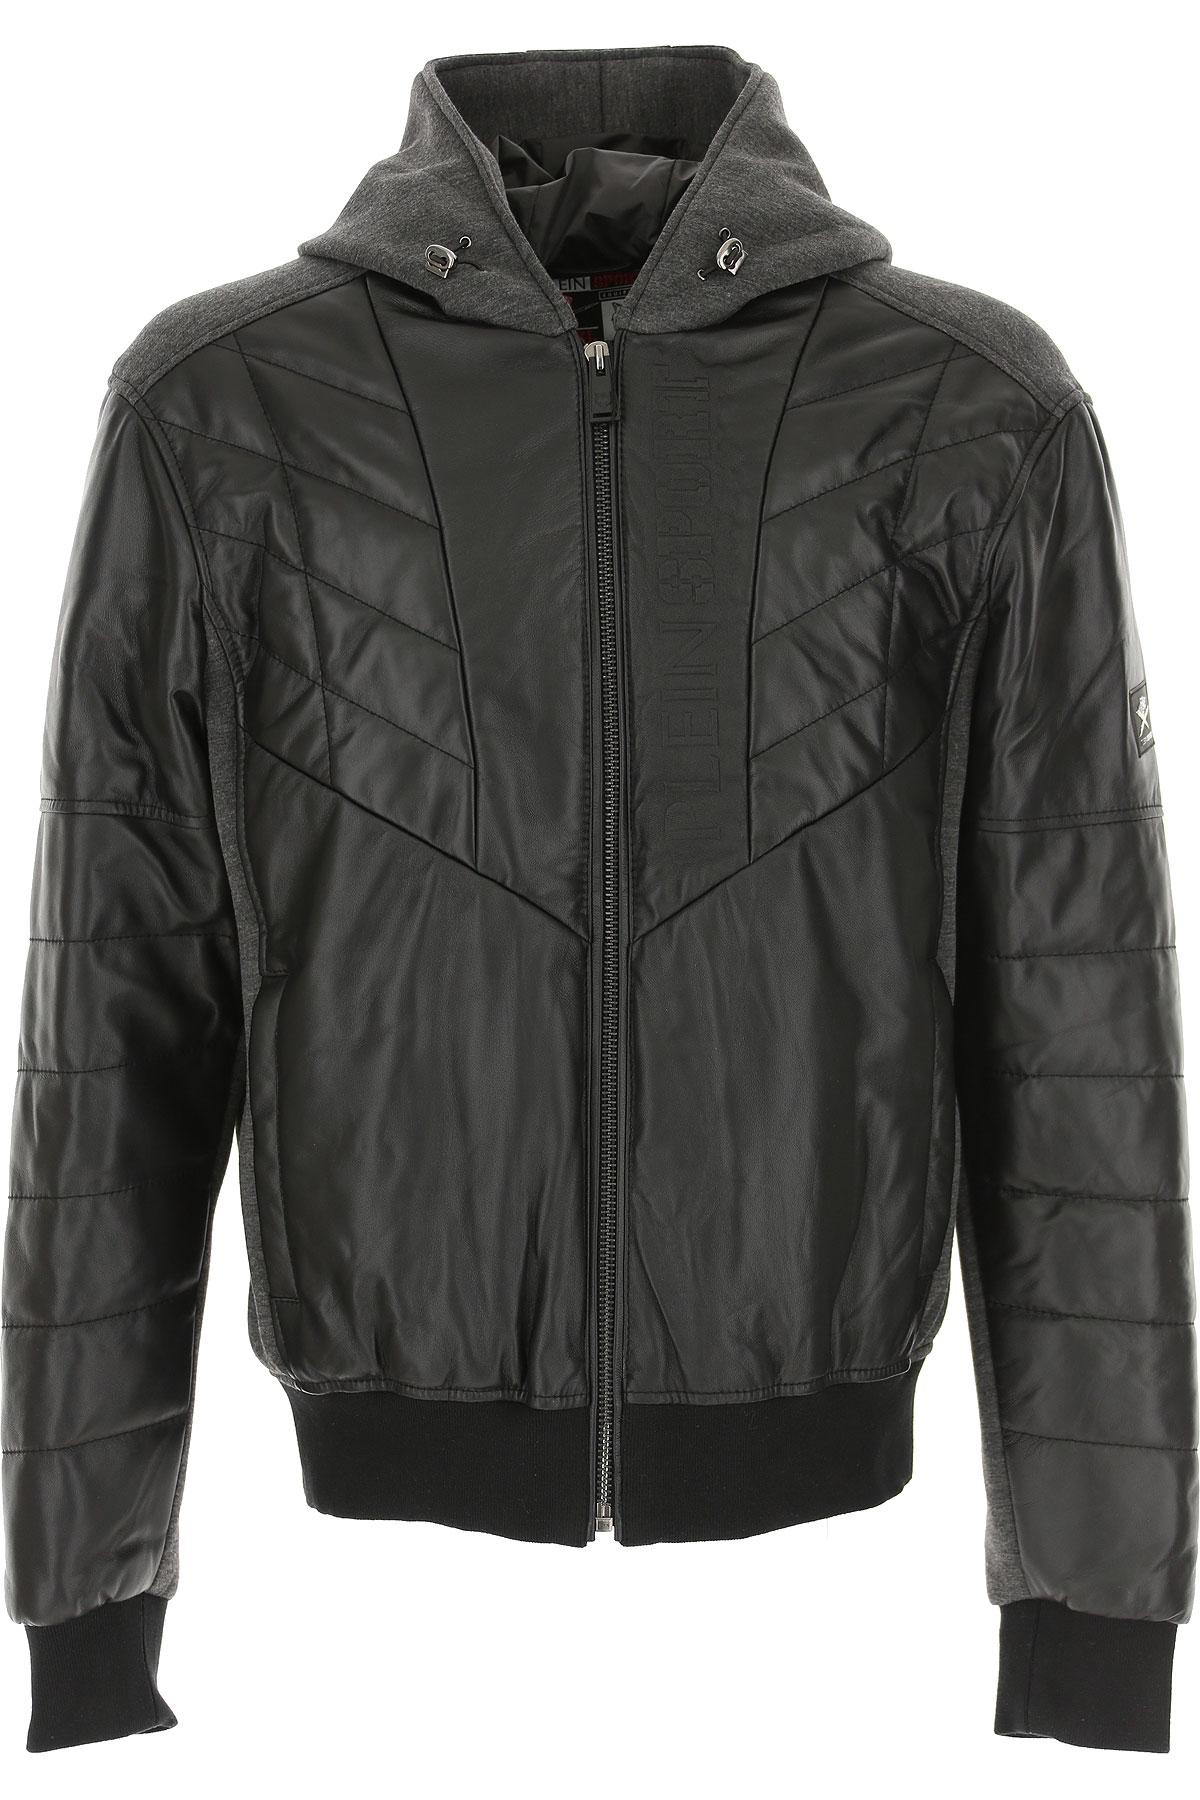 Philipp Plein Down Jacket for Men, Puffer Ski Jacket On Sale, Black, Leather, 2019, L XL XXL